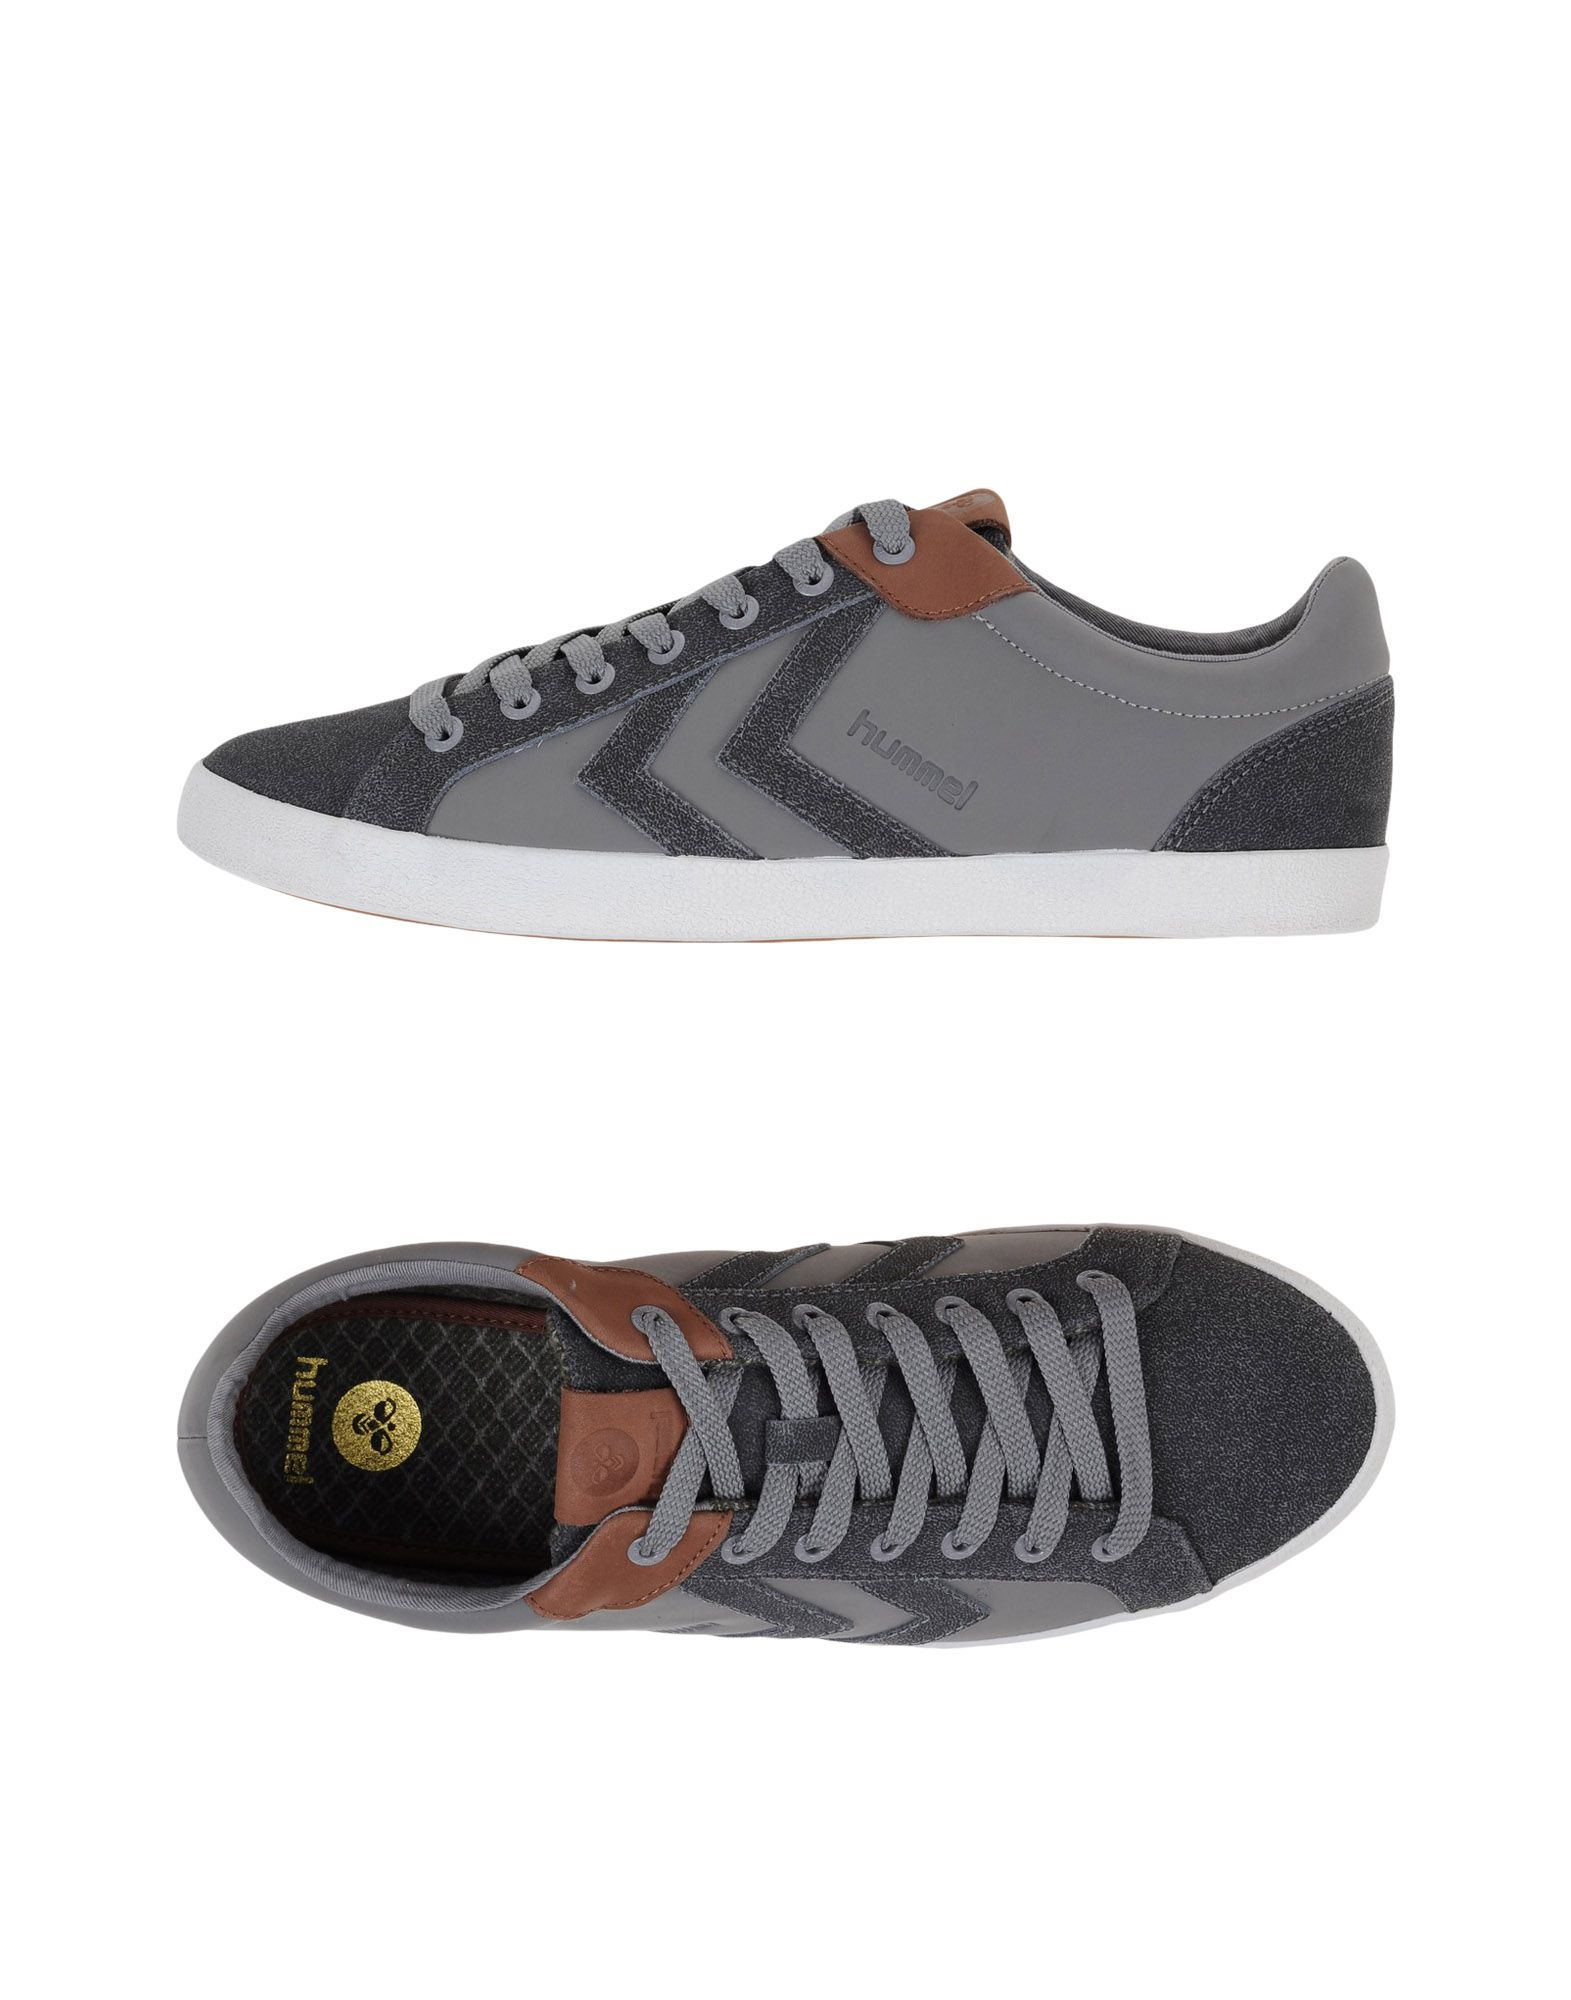 Sneakers Hummel Deuce Court Winter - Homme - Sneakers Hummel sur